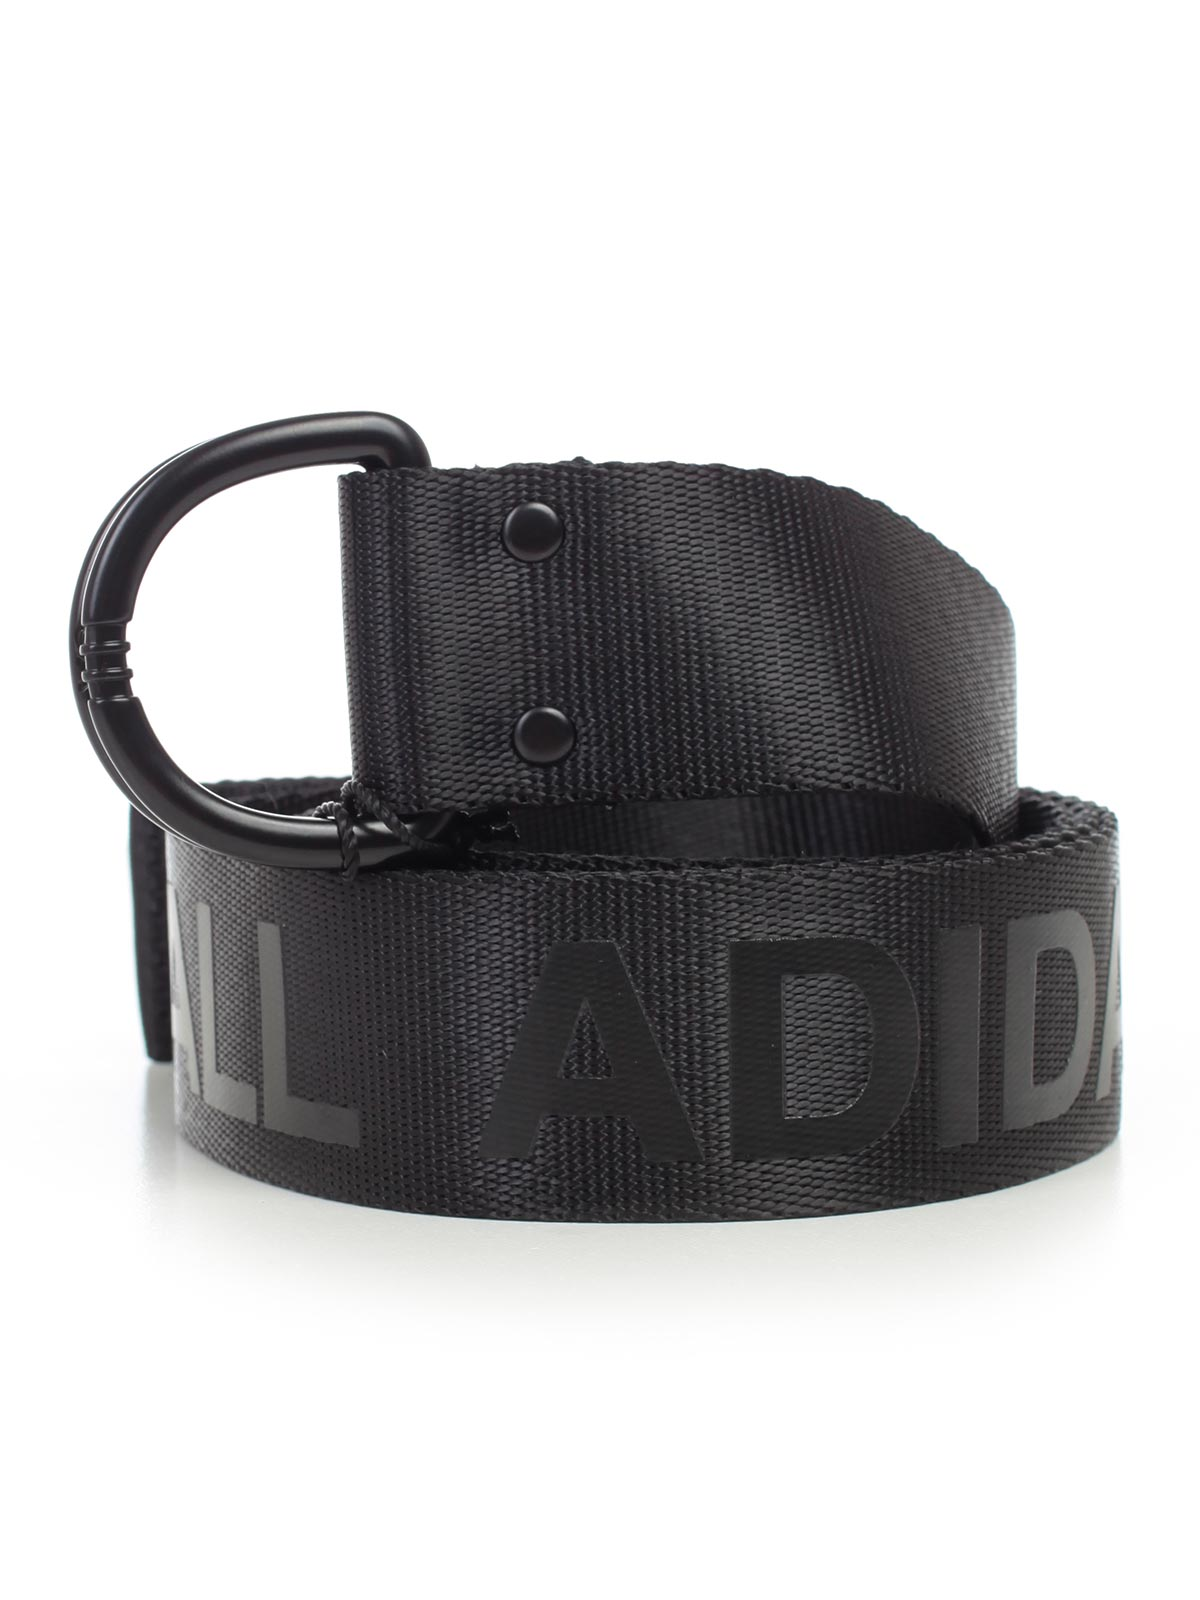 Picture of Y-3 Yohji Yamamoto Adidas  Belt